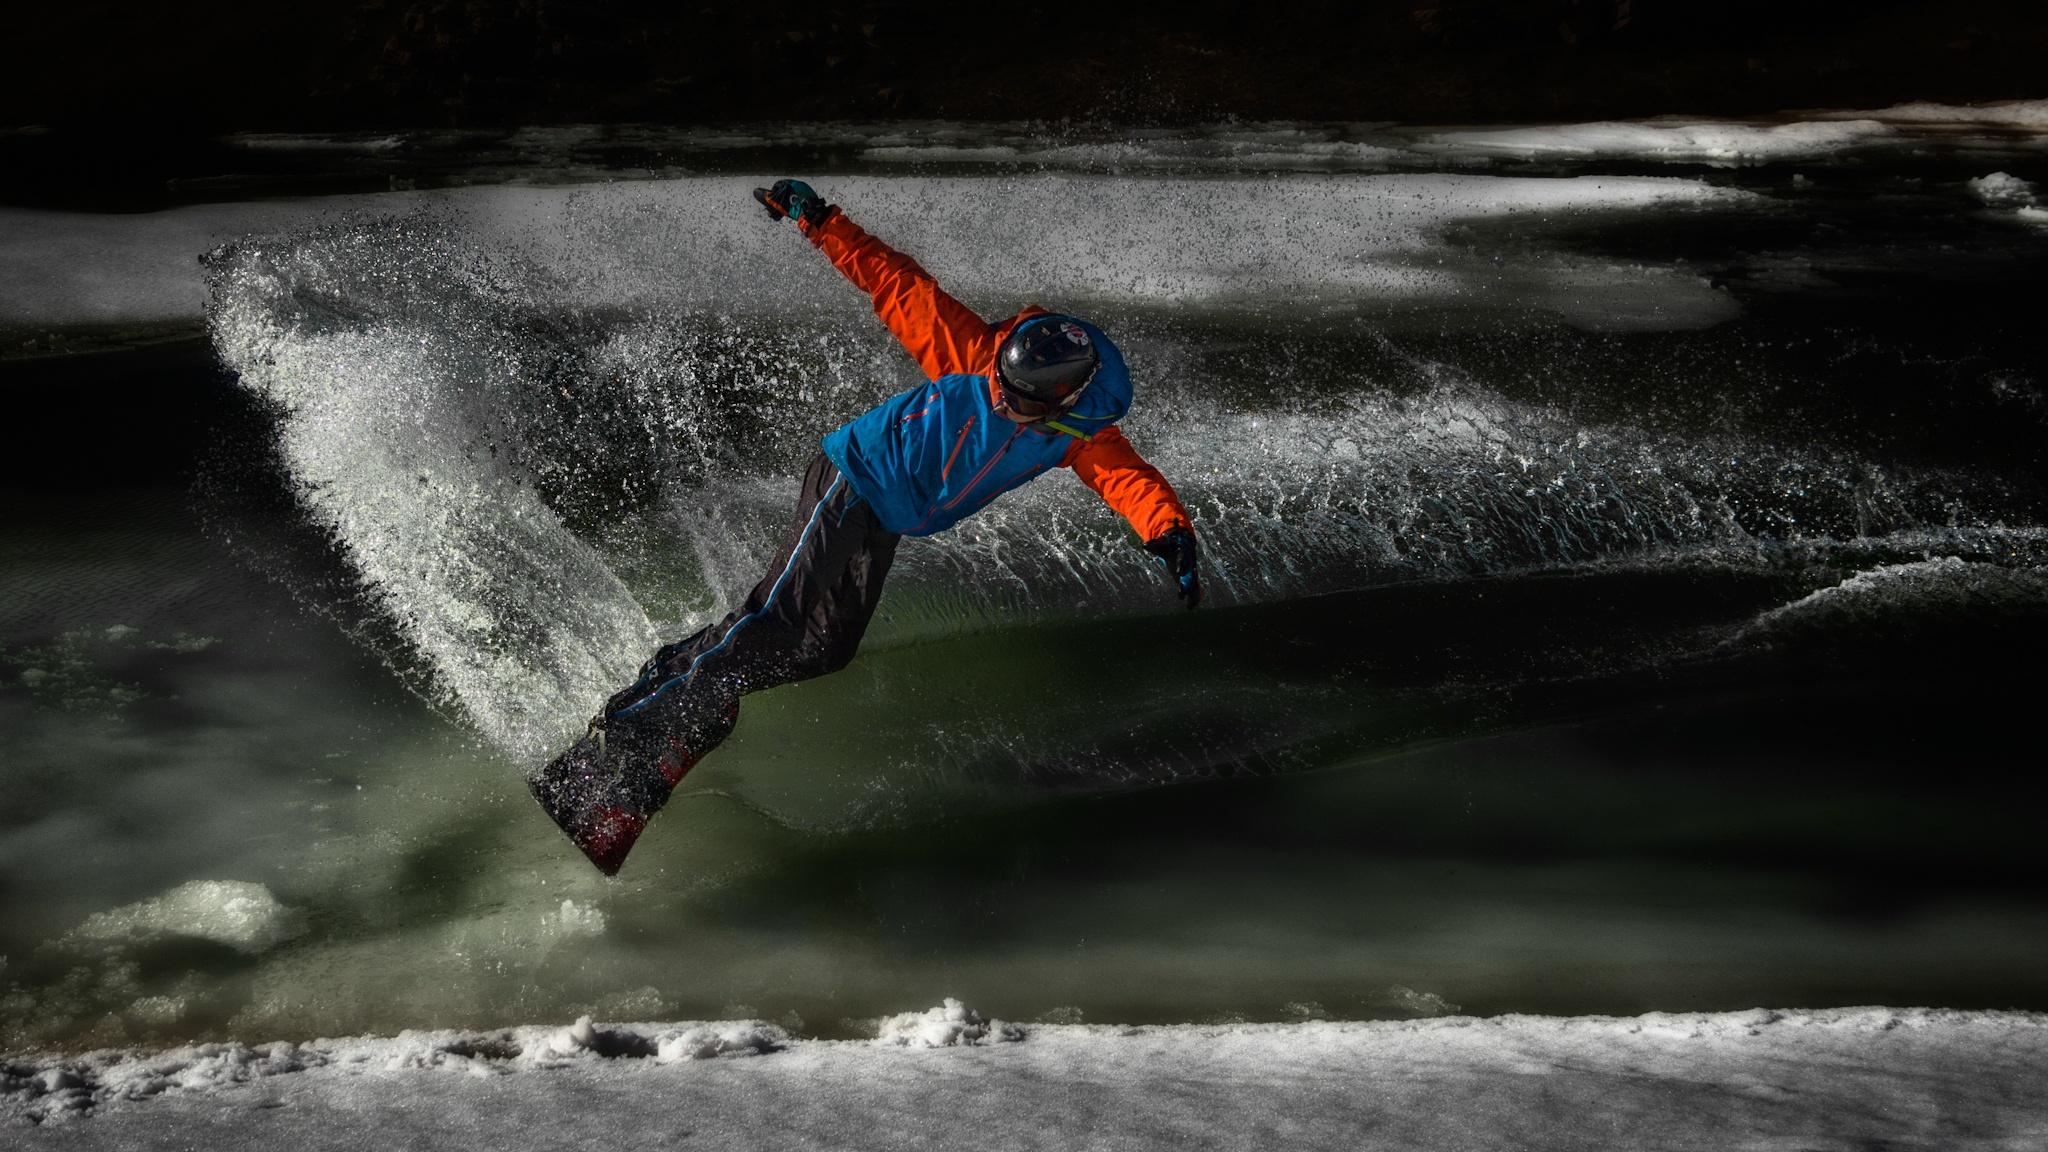 Panticosa, Ekaitz Isasi - Ski & Snowboard - Fotos del Valle del Aragón, Mikel Besga